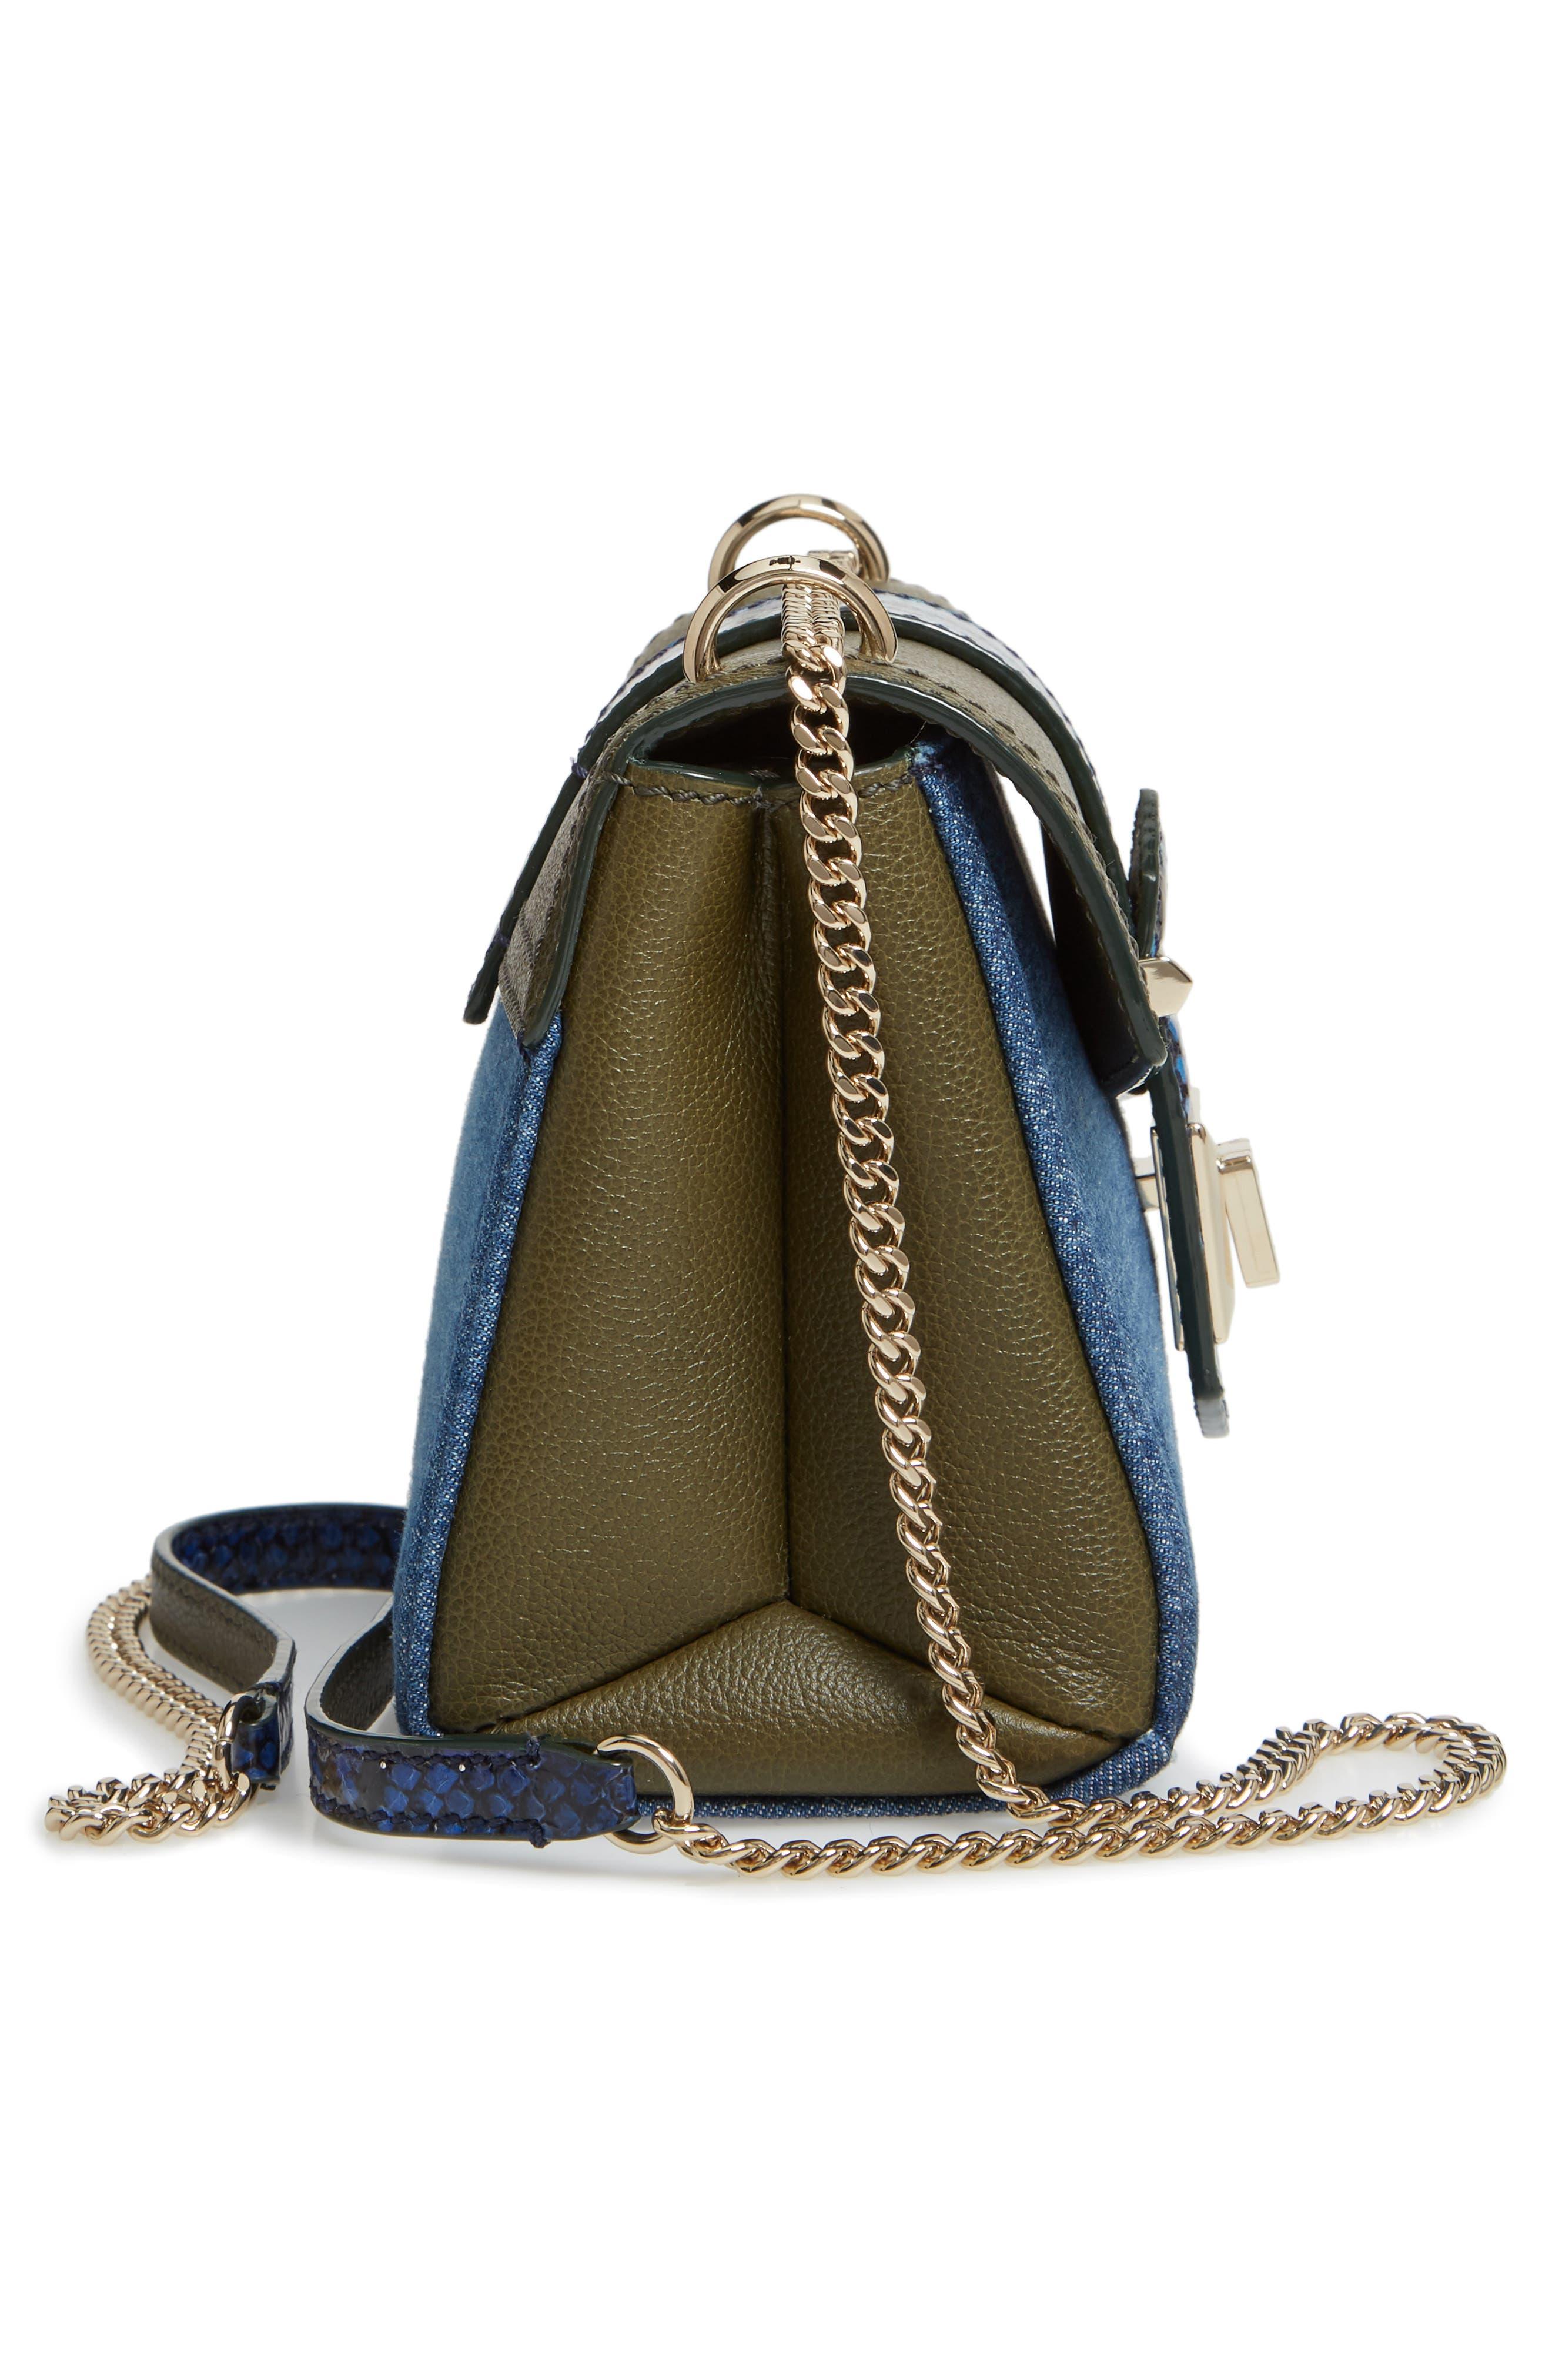 Marianne Leather & Genuine Snakeskin Crossbody Bag,                             Alternate thumbnail 6, color,                             NAVY MIX